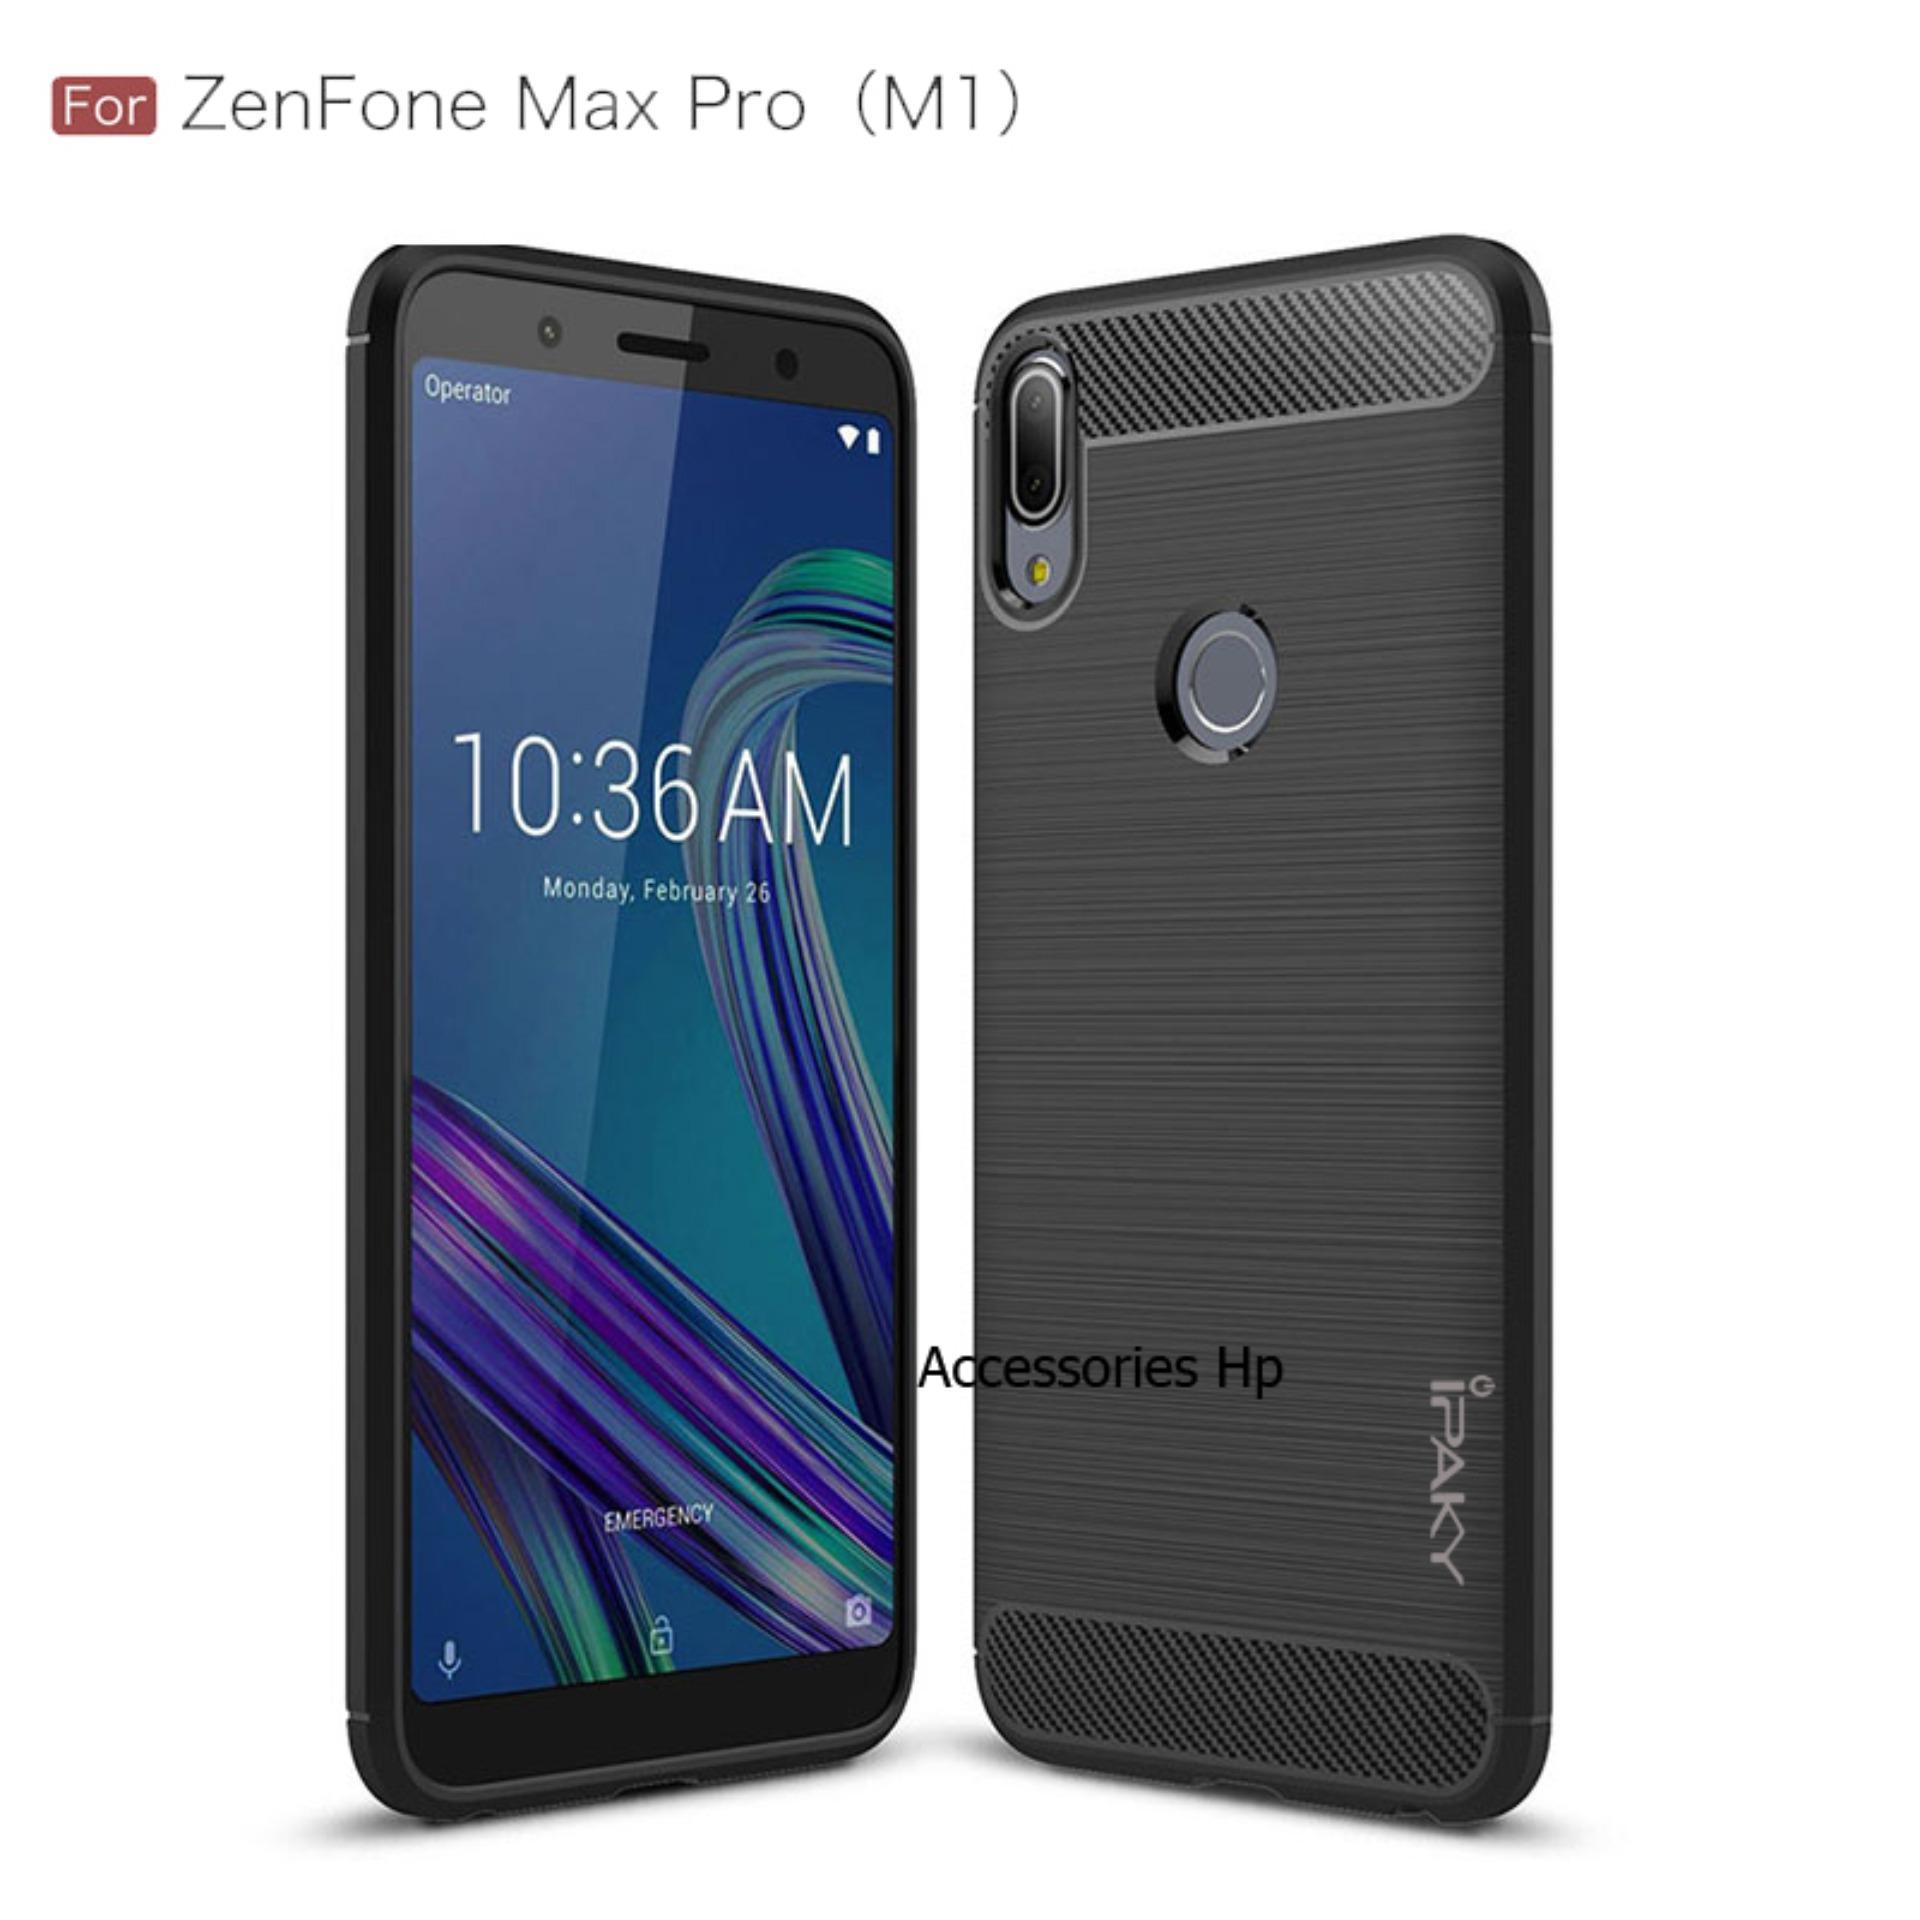 Accessories Hp Premium Quality Carbon Shockproof Hybrid Case For Asus Zenfone Max Pro M1 ZB602KL -